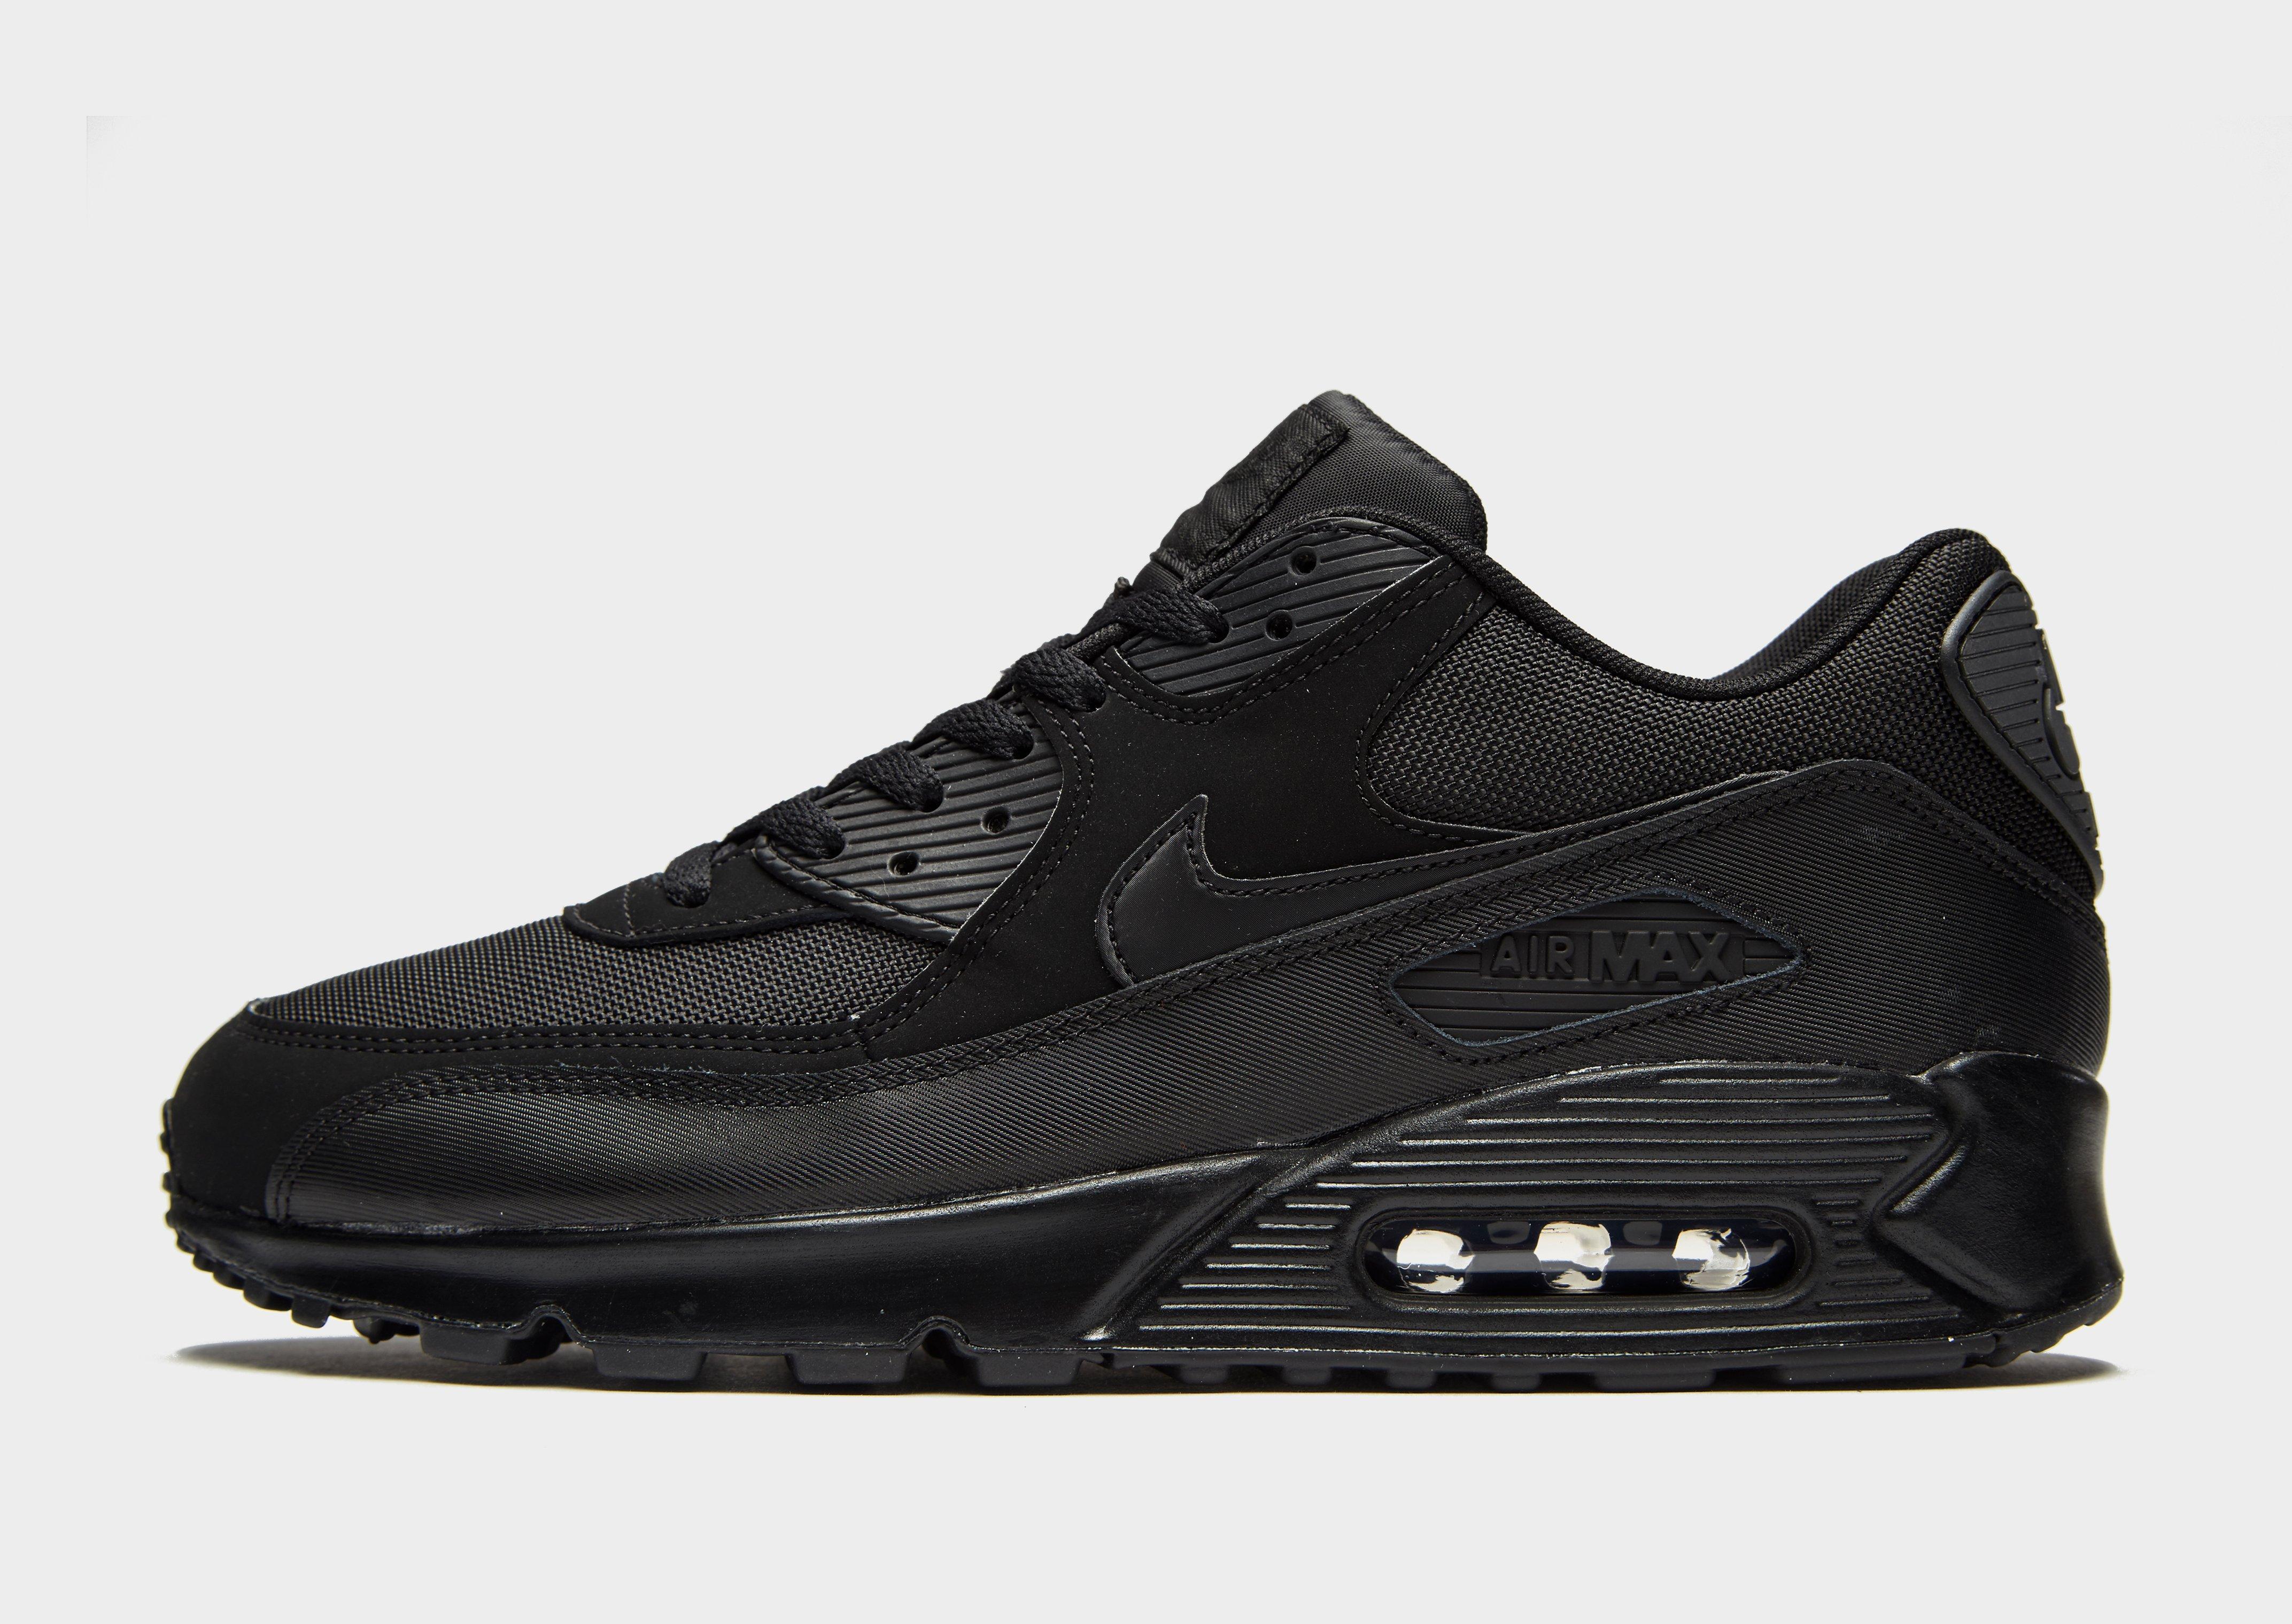 air max black, Nike Air Max 1 Triple Black - Le Site de la ...